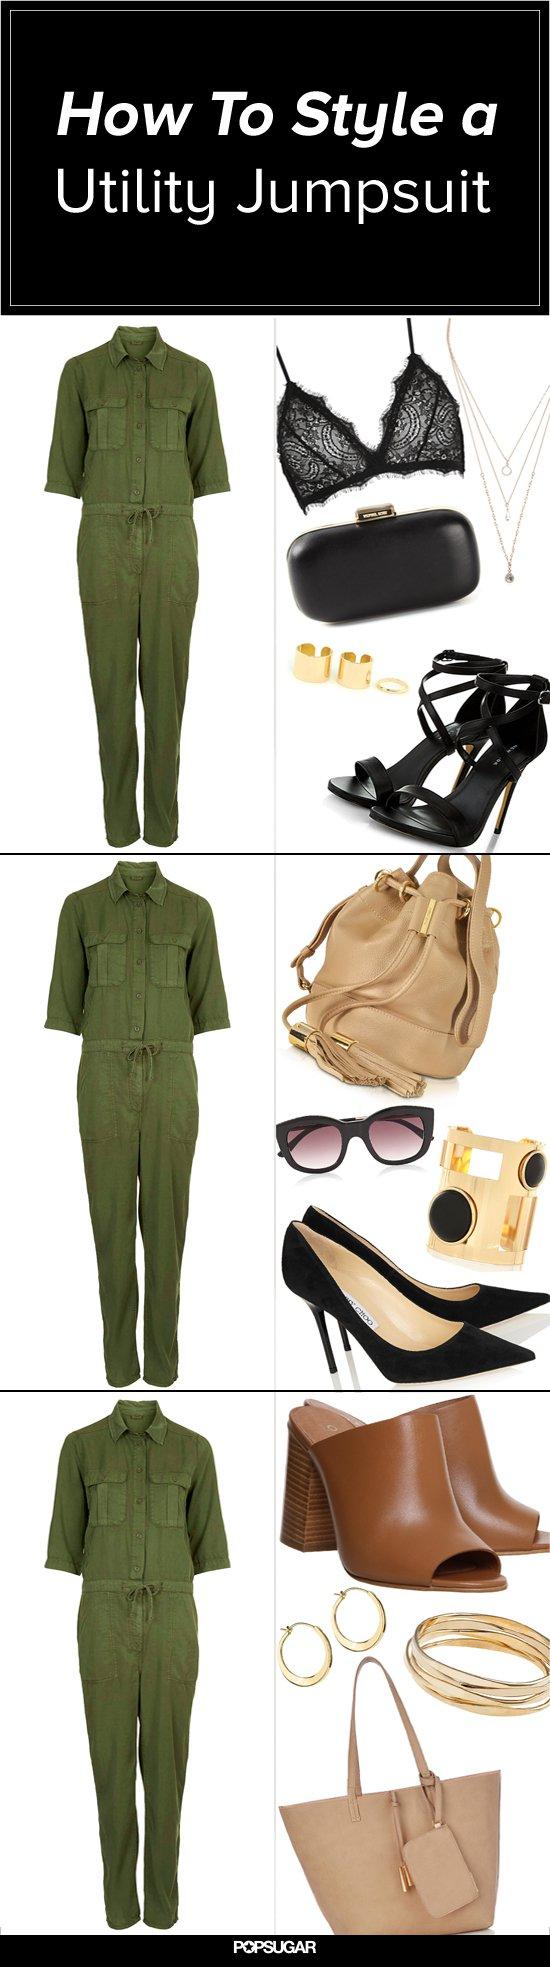 5 Stylish Ways to Wear a Utility Jumpsuit